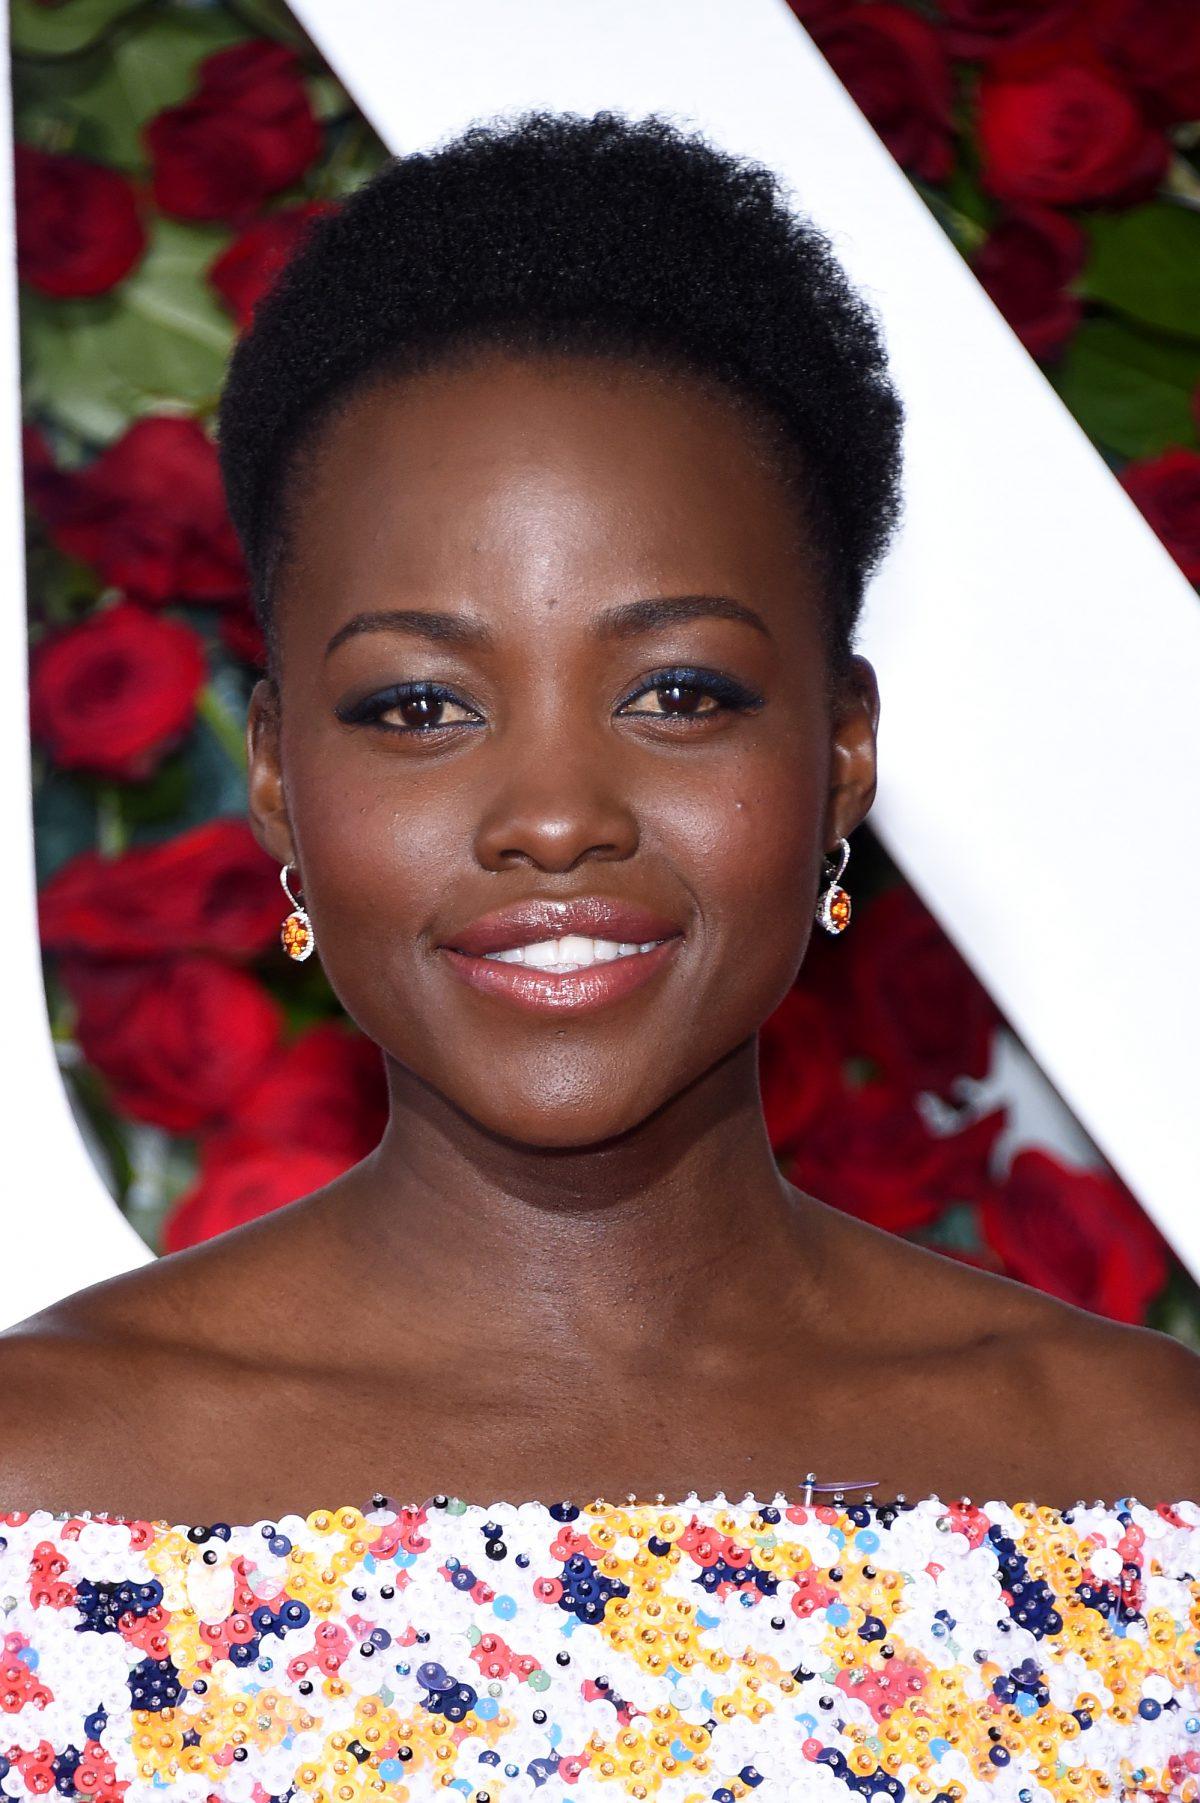 The Trick To Lupita Nyong'o's Luminous Tony Awards Glow